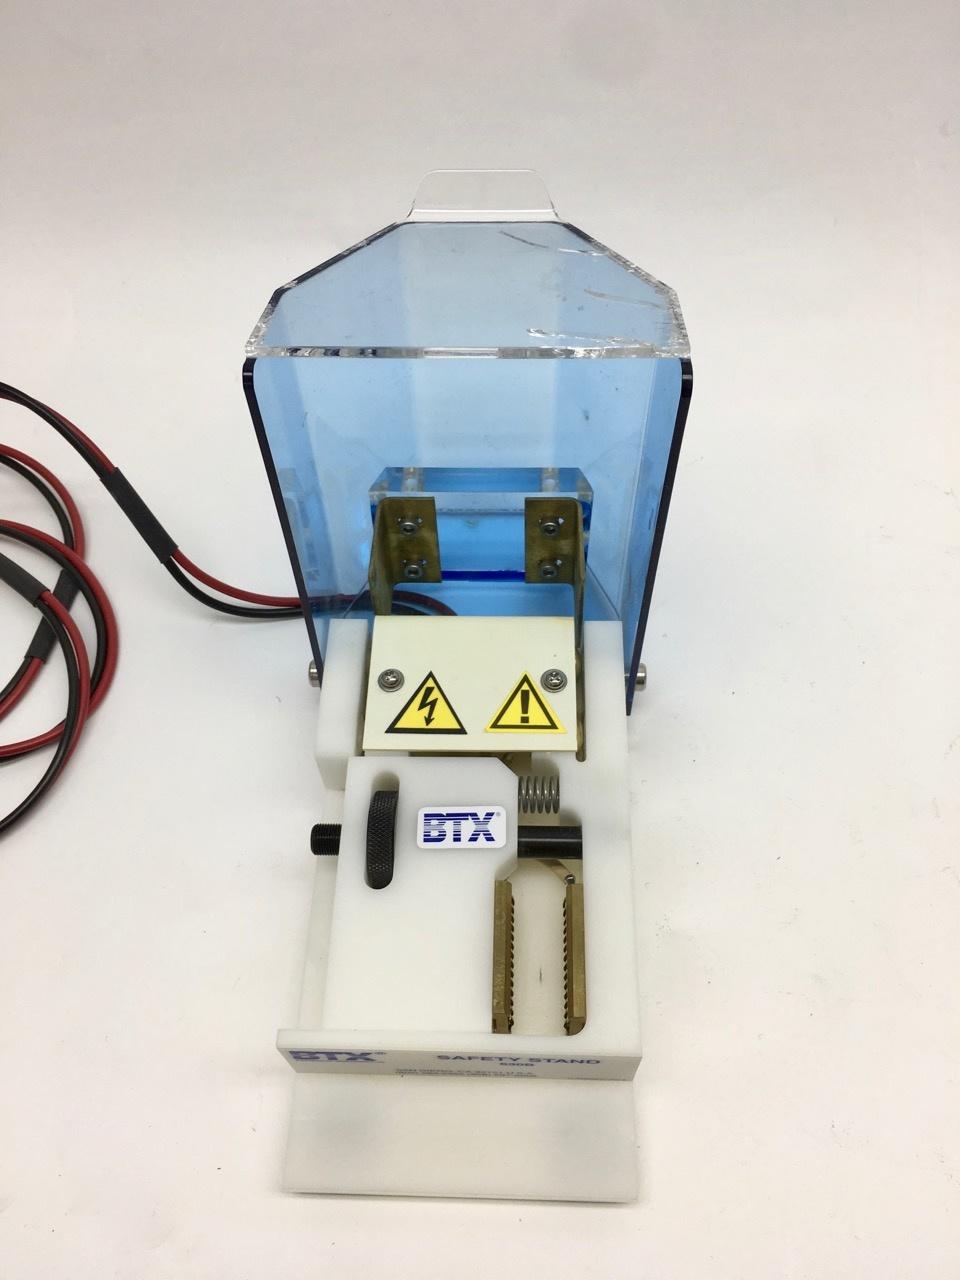 BTX BTX ECM 830 Square Wave Electroporator mit BTX Safety Stand 630B